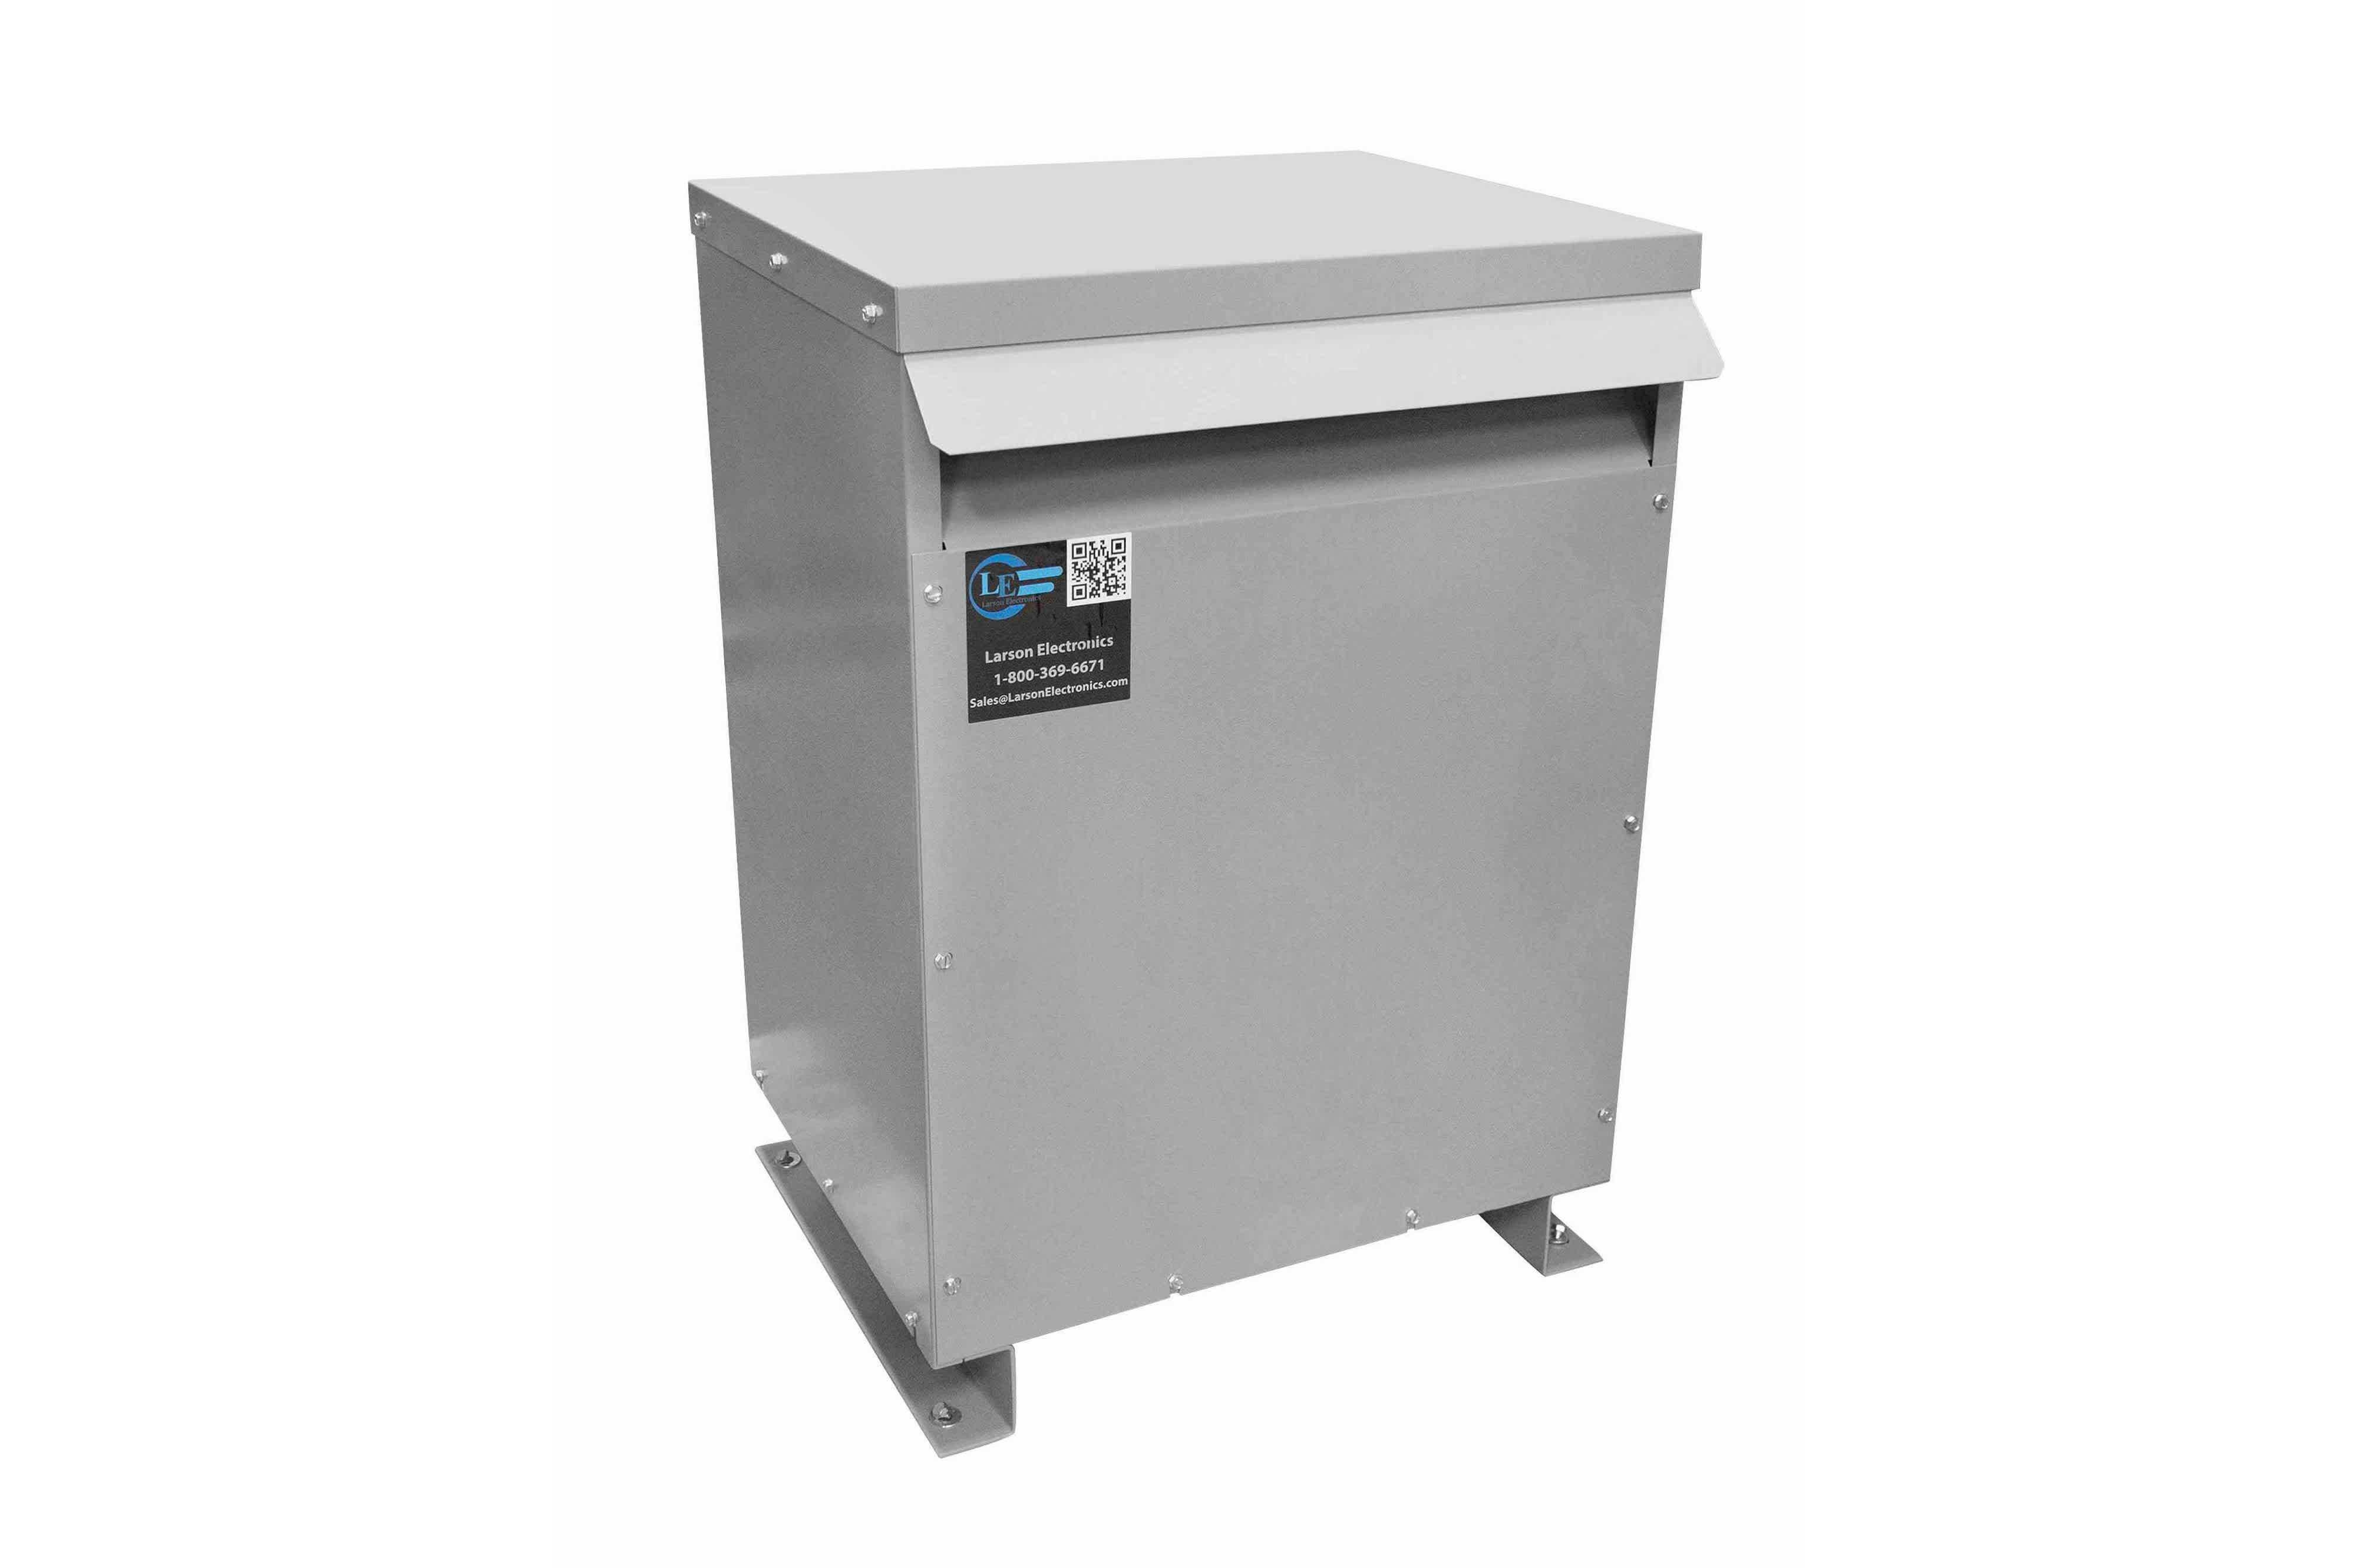 11 kVA 3PH Isolation Transformer, 415V Wye Primary, 480V Delta Secondary, N3R, Ventilated, 60 Hz